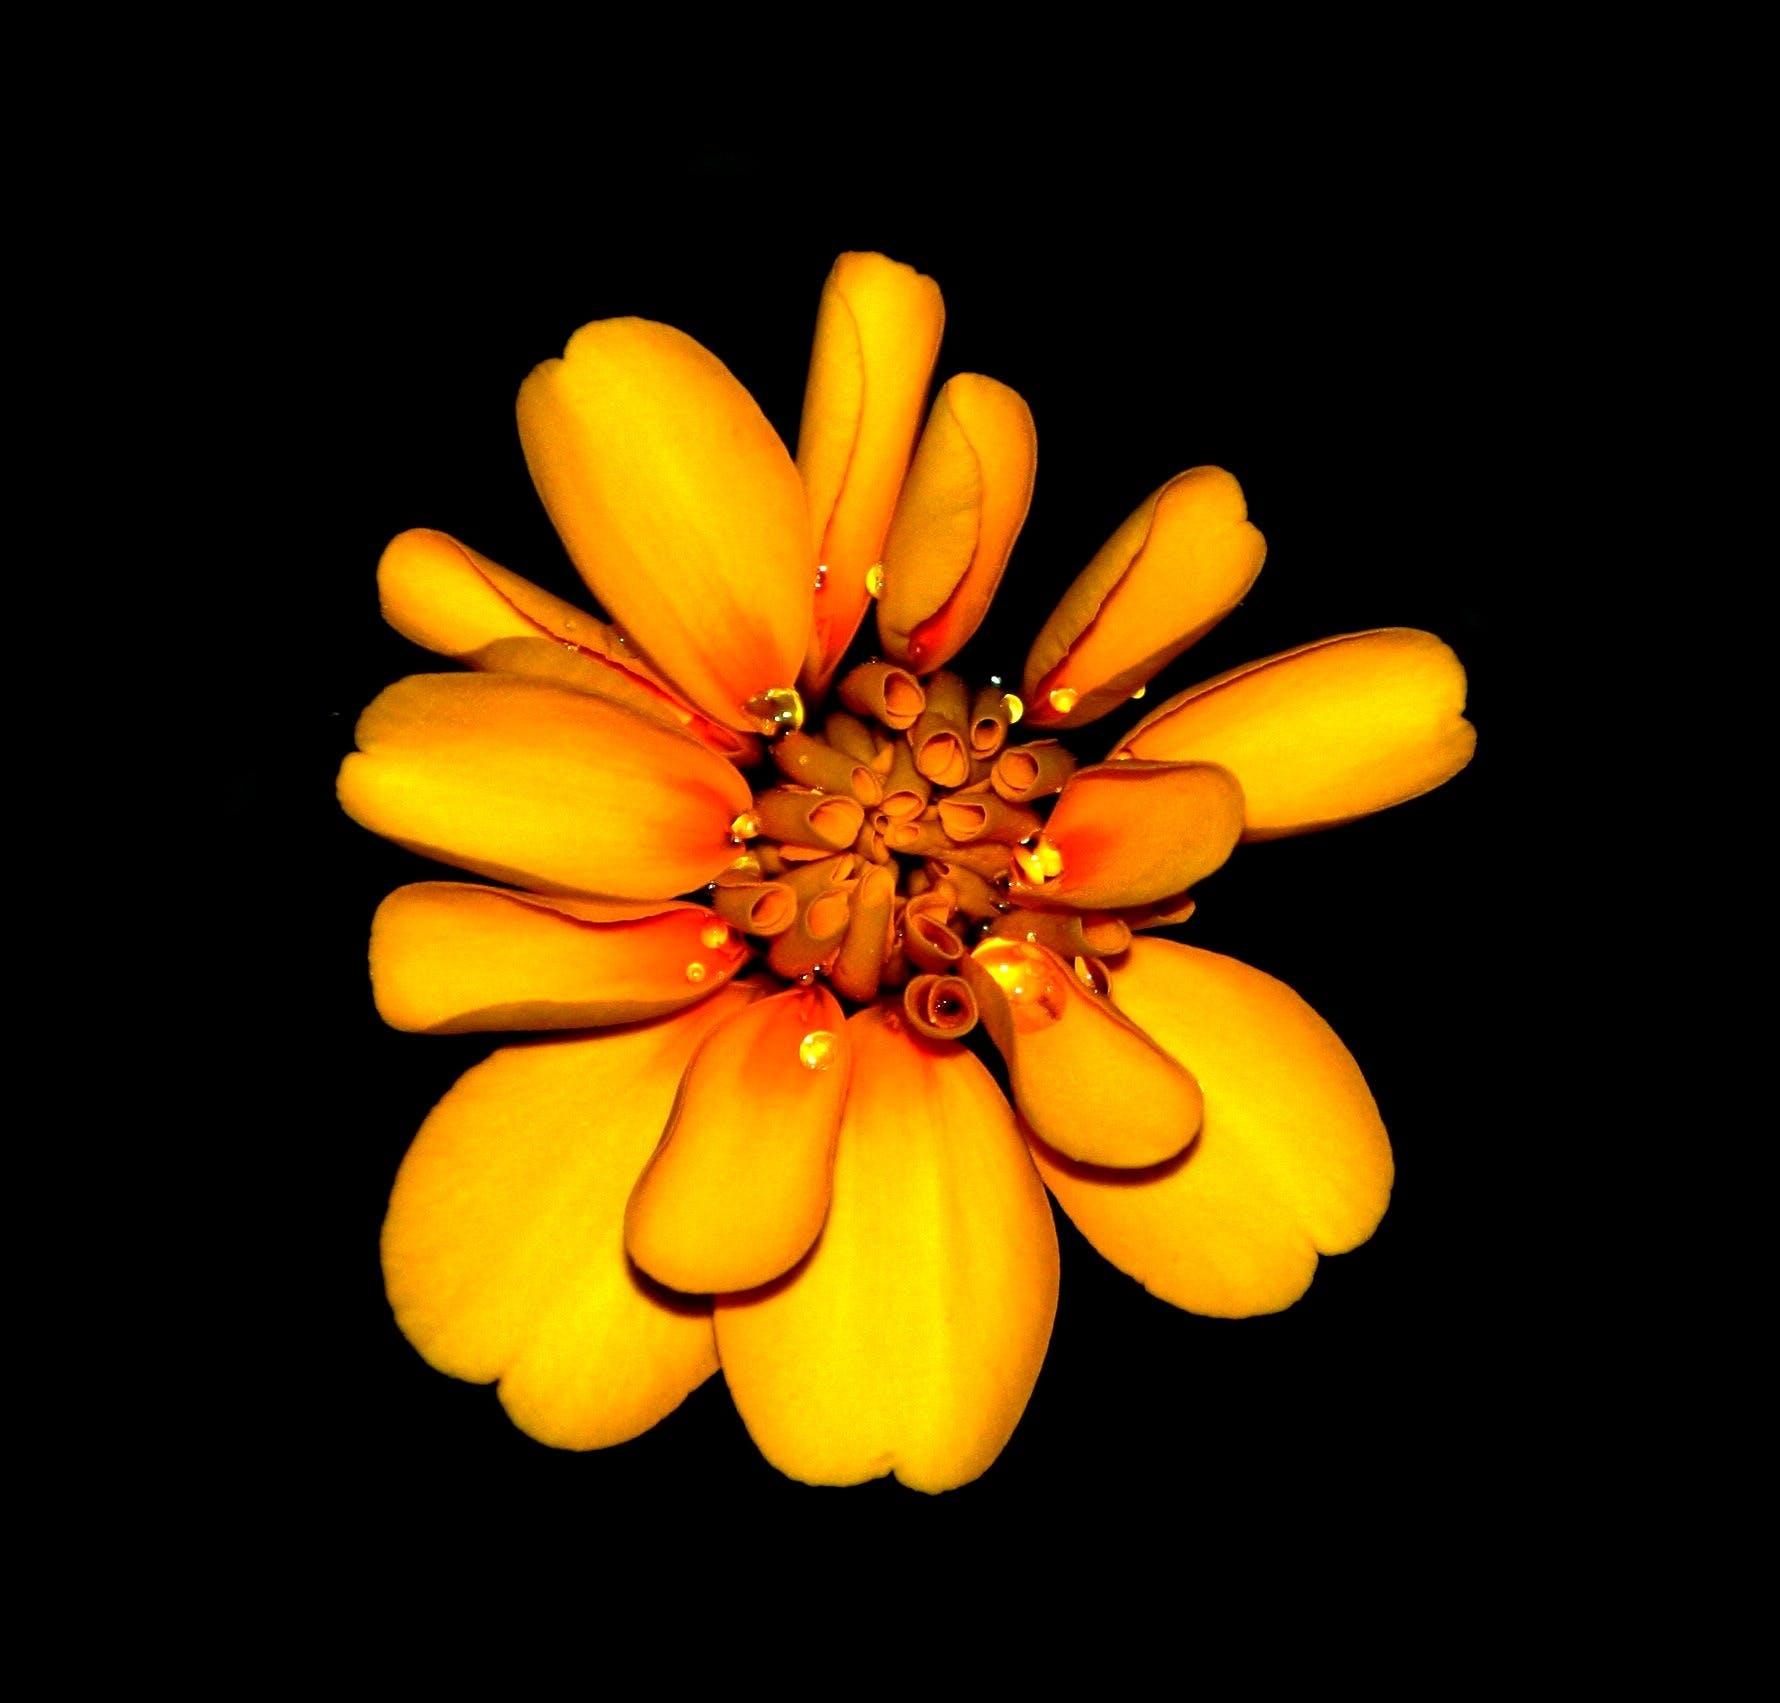 Kostnadsfri bild av blomma, flora, gul orange, kronblad